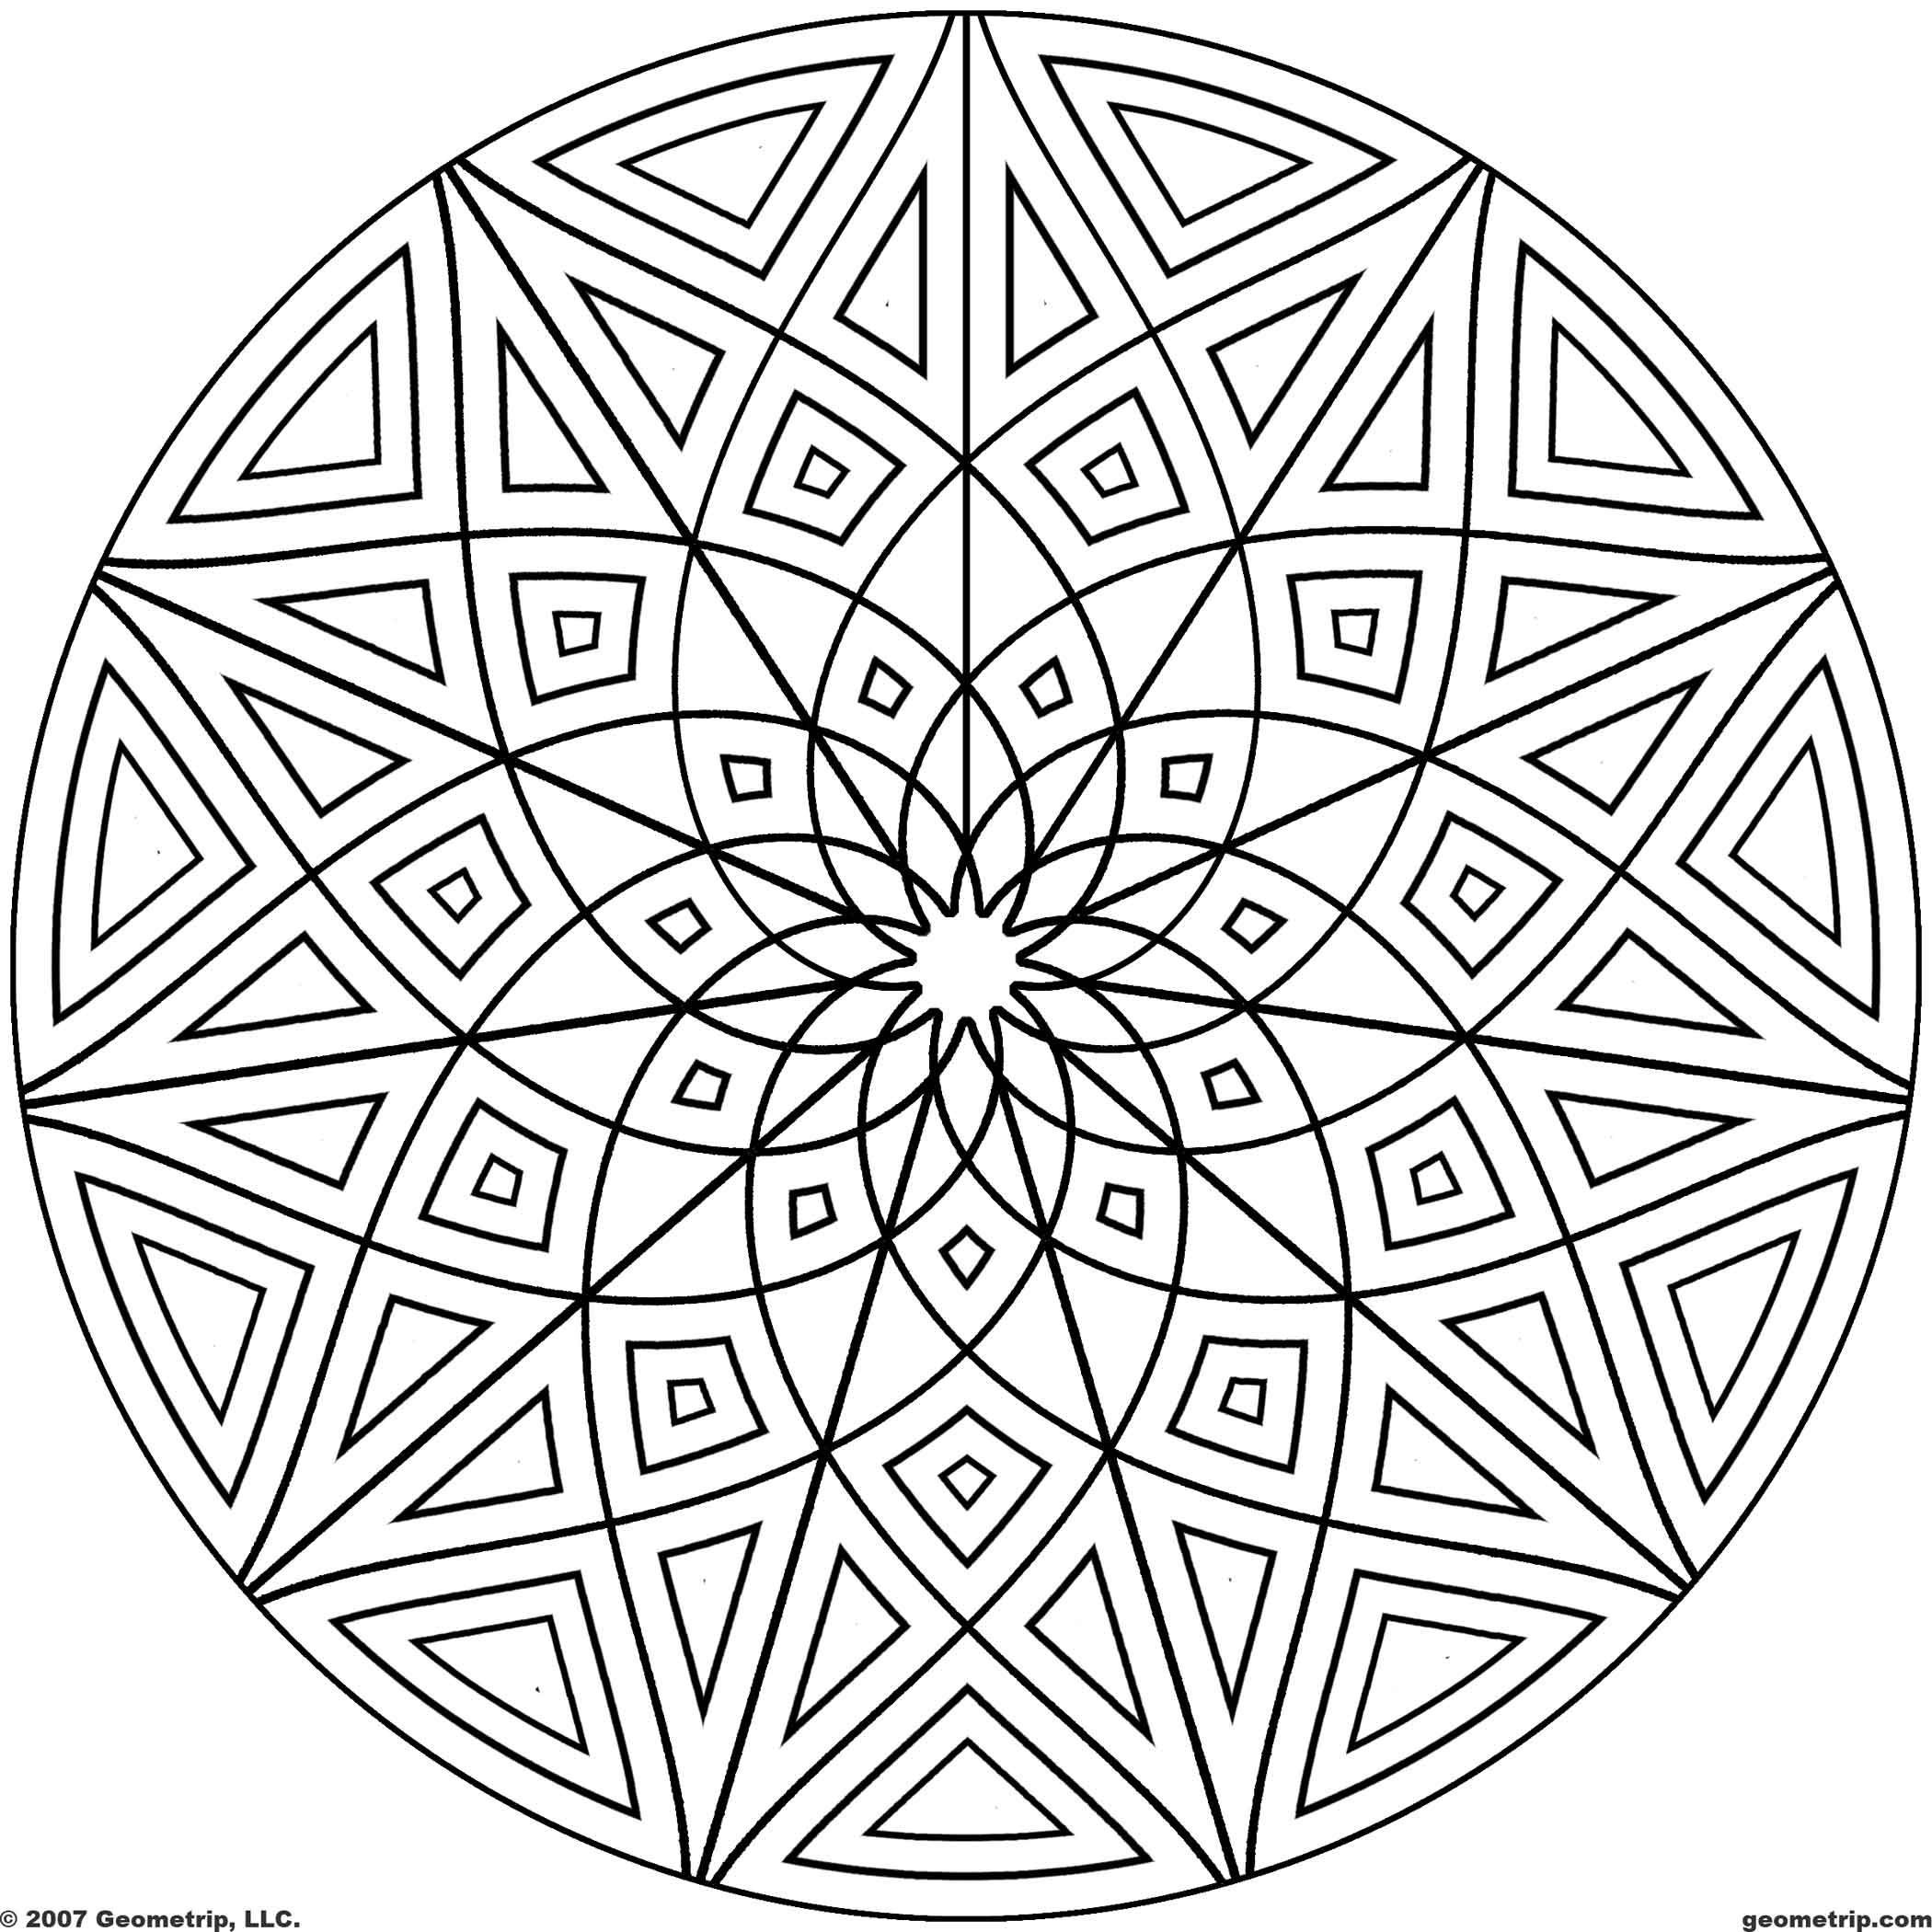 Kaleidoscope Coloring Pages Geometrip Free Geometric